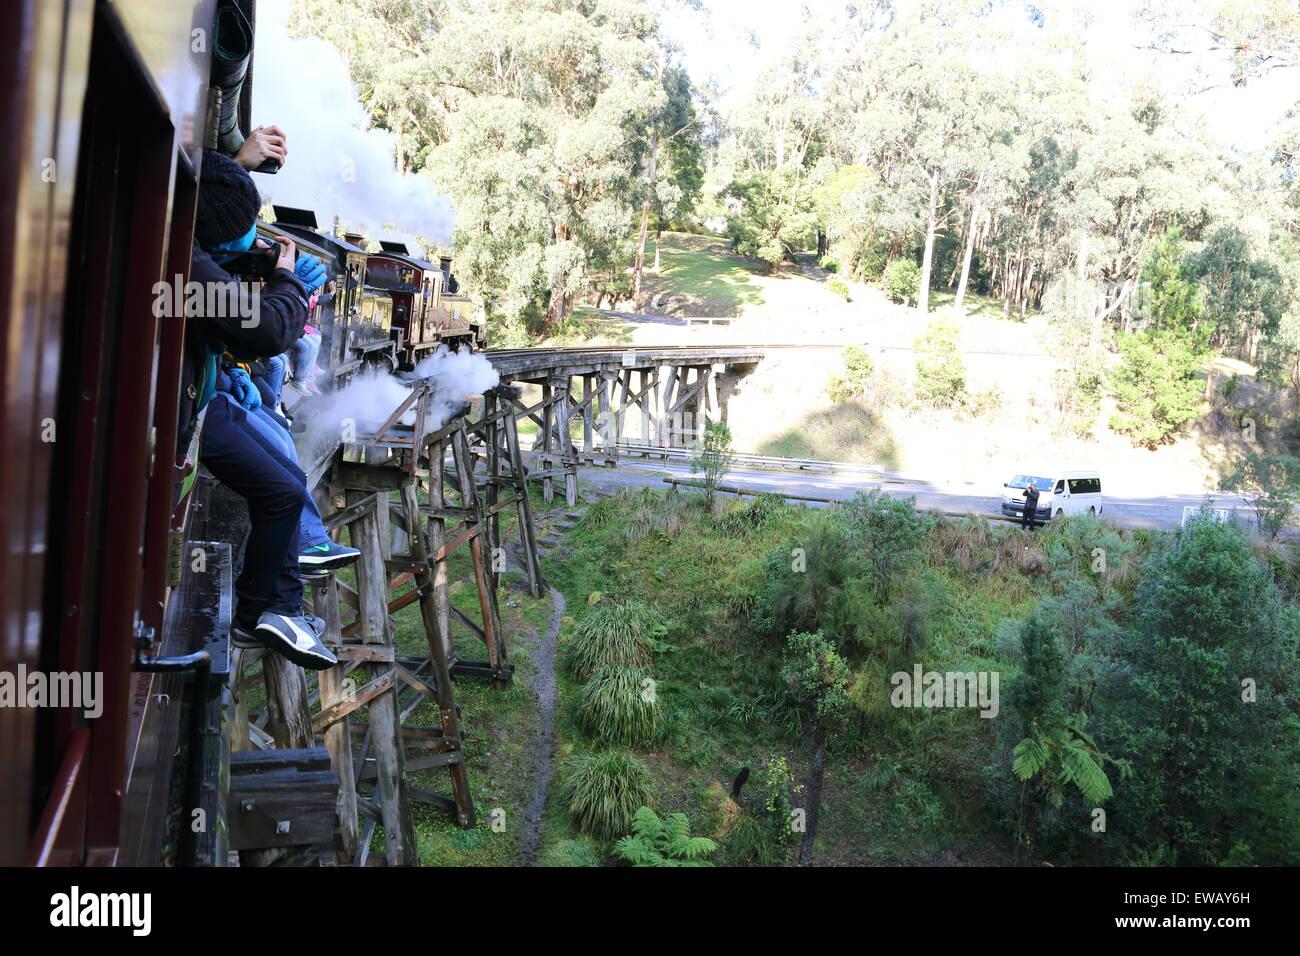 Puffing Billy steam train running on Trestle Bridge Belgrave Victoria Australia - Stock Image